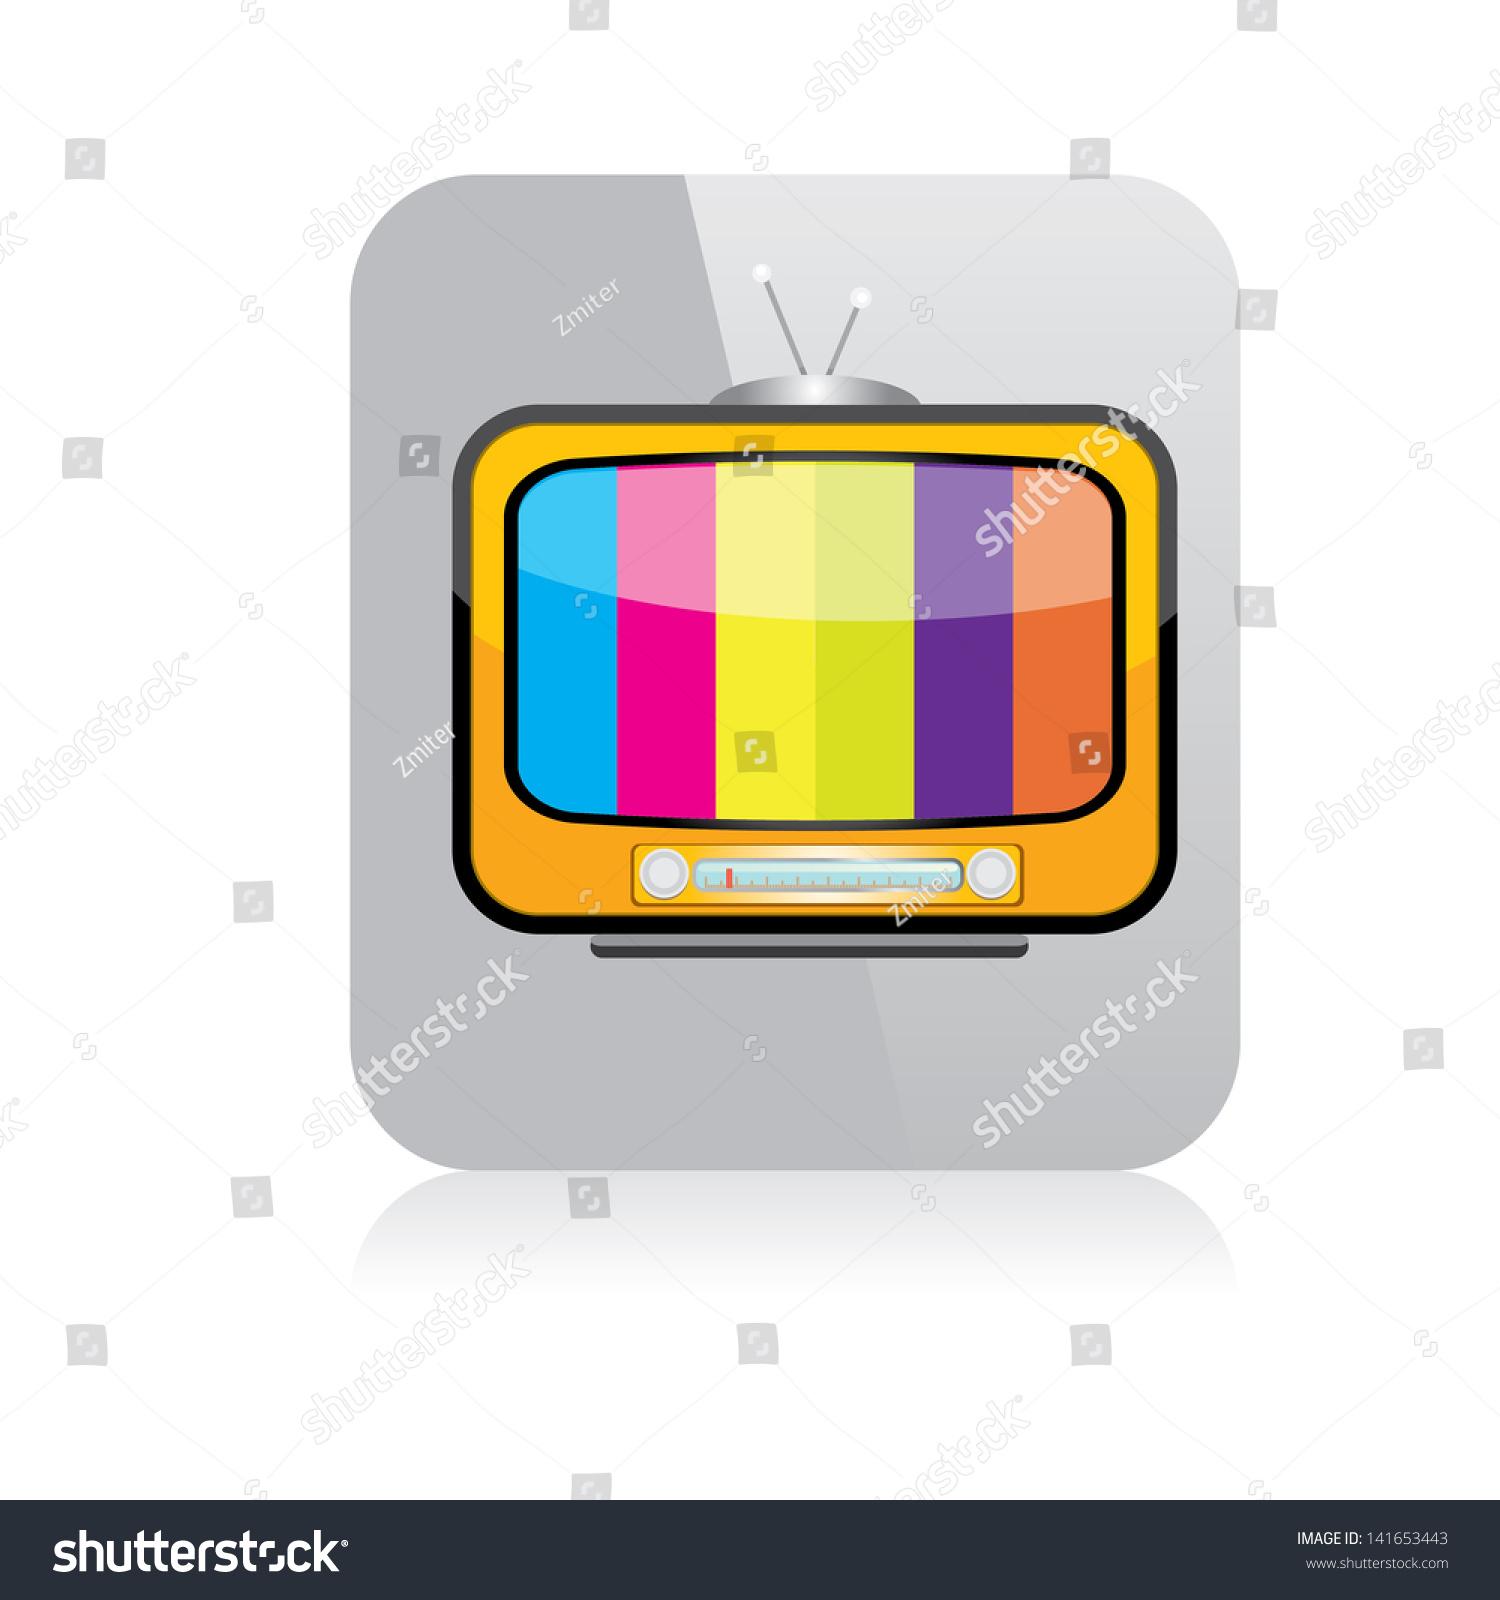 Vector Tv Icon Online Tv Symbol Stock Vector (Royalty Free) 141653443